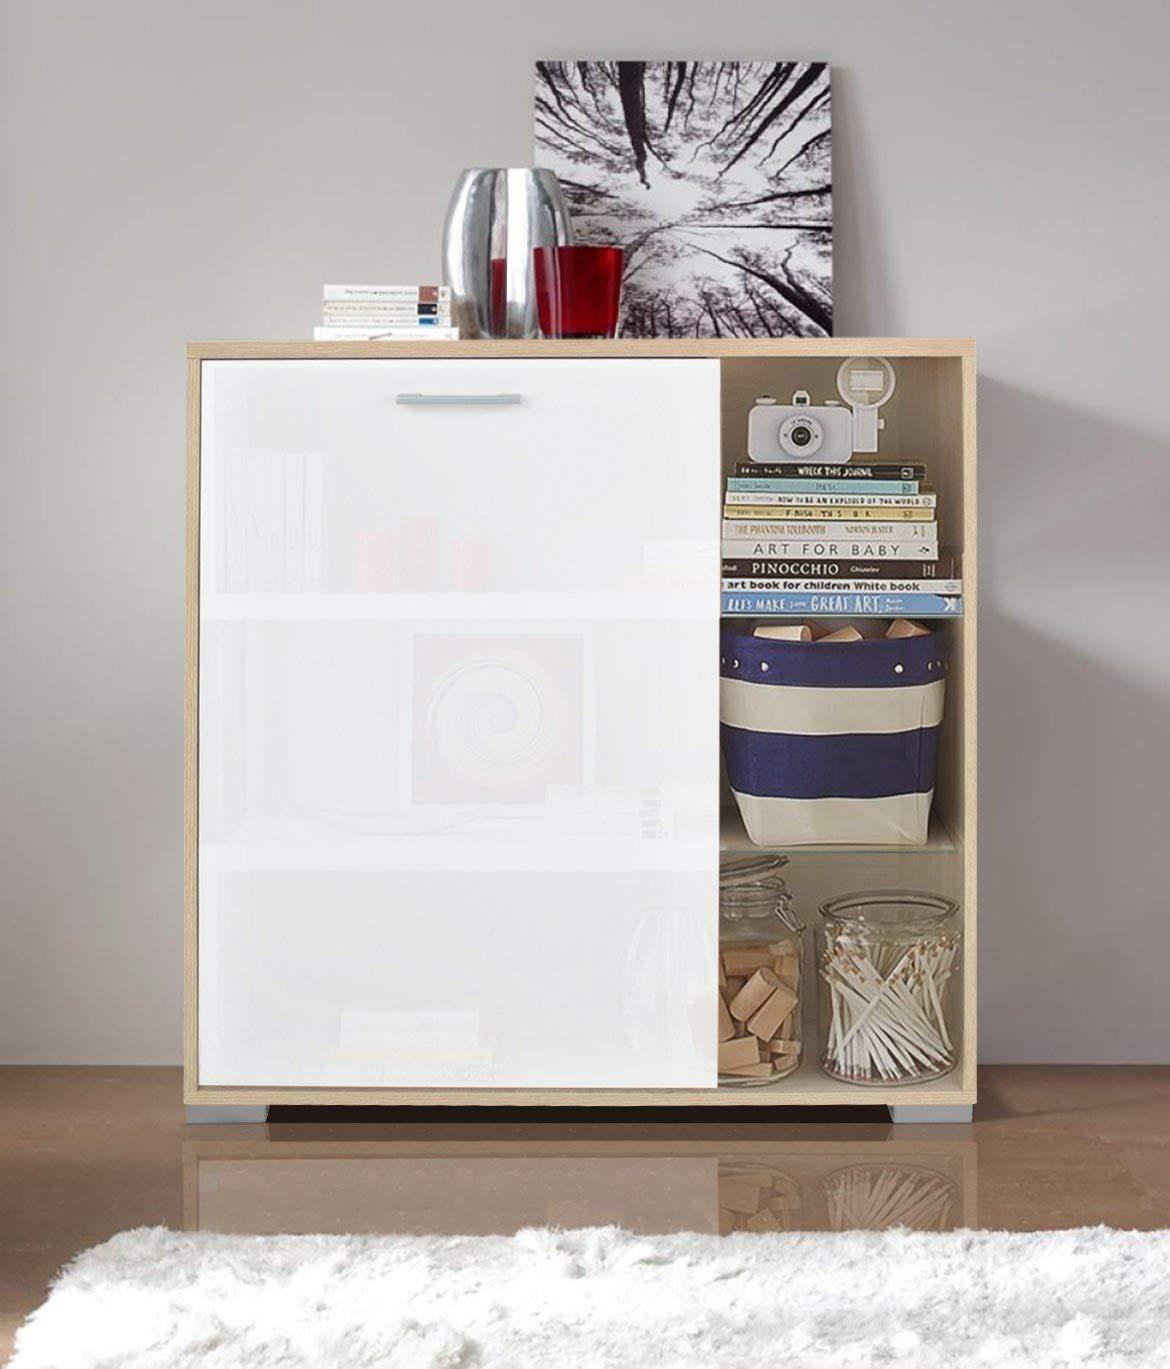 Ideal Alaska Sideboard Shoe Cupboard Storage Solution Furniture Oak Matt White W89CM H92CM D38CM